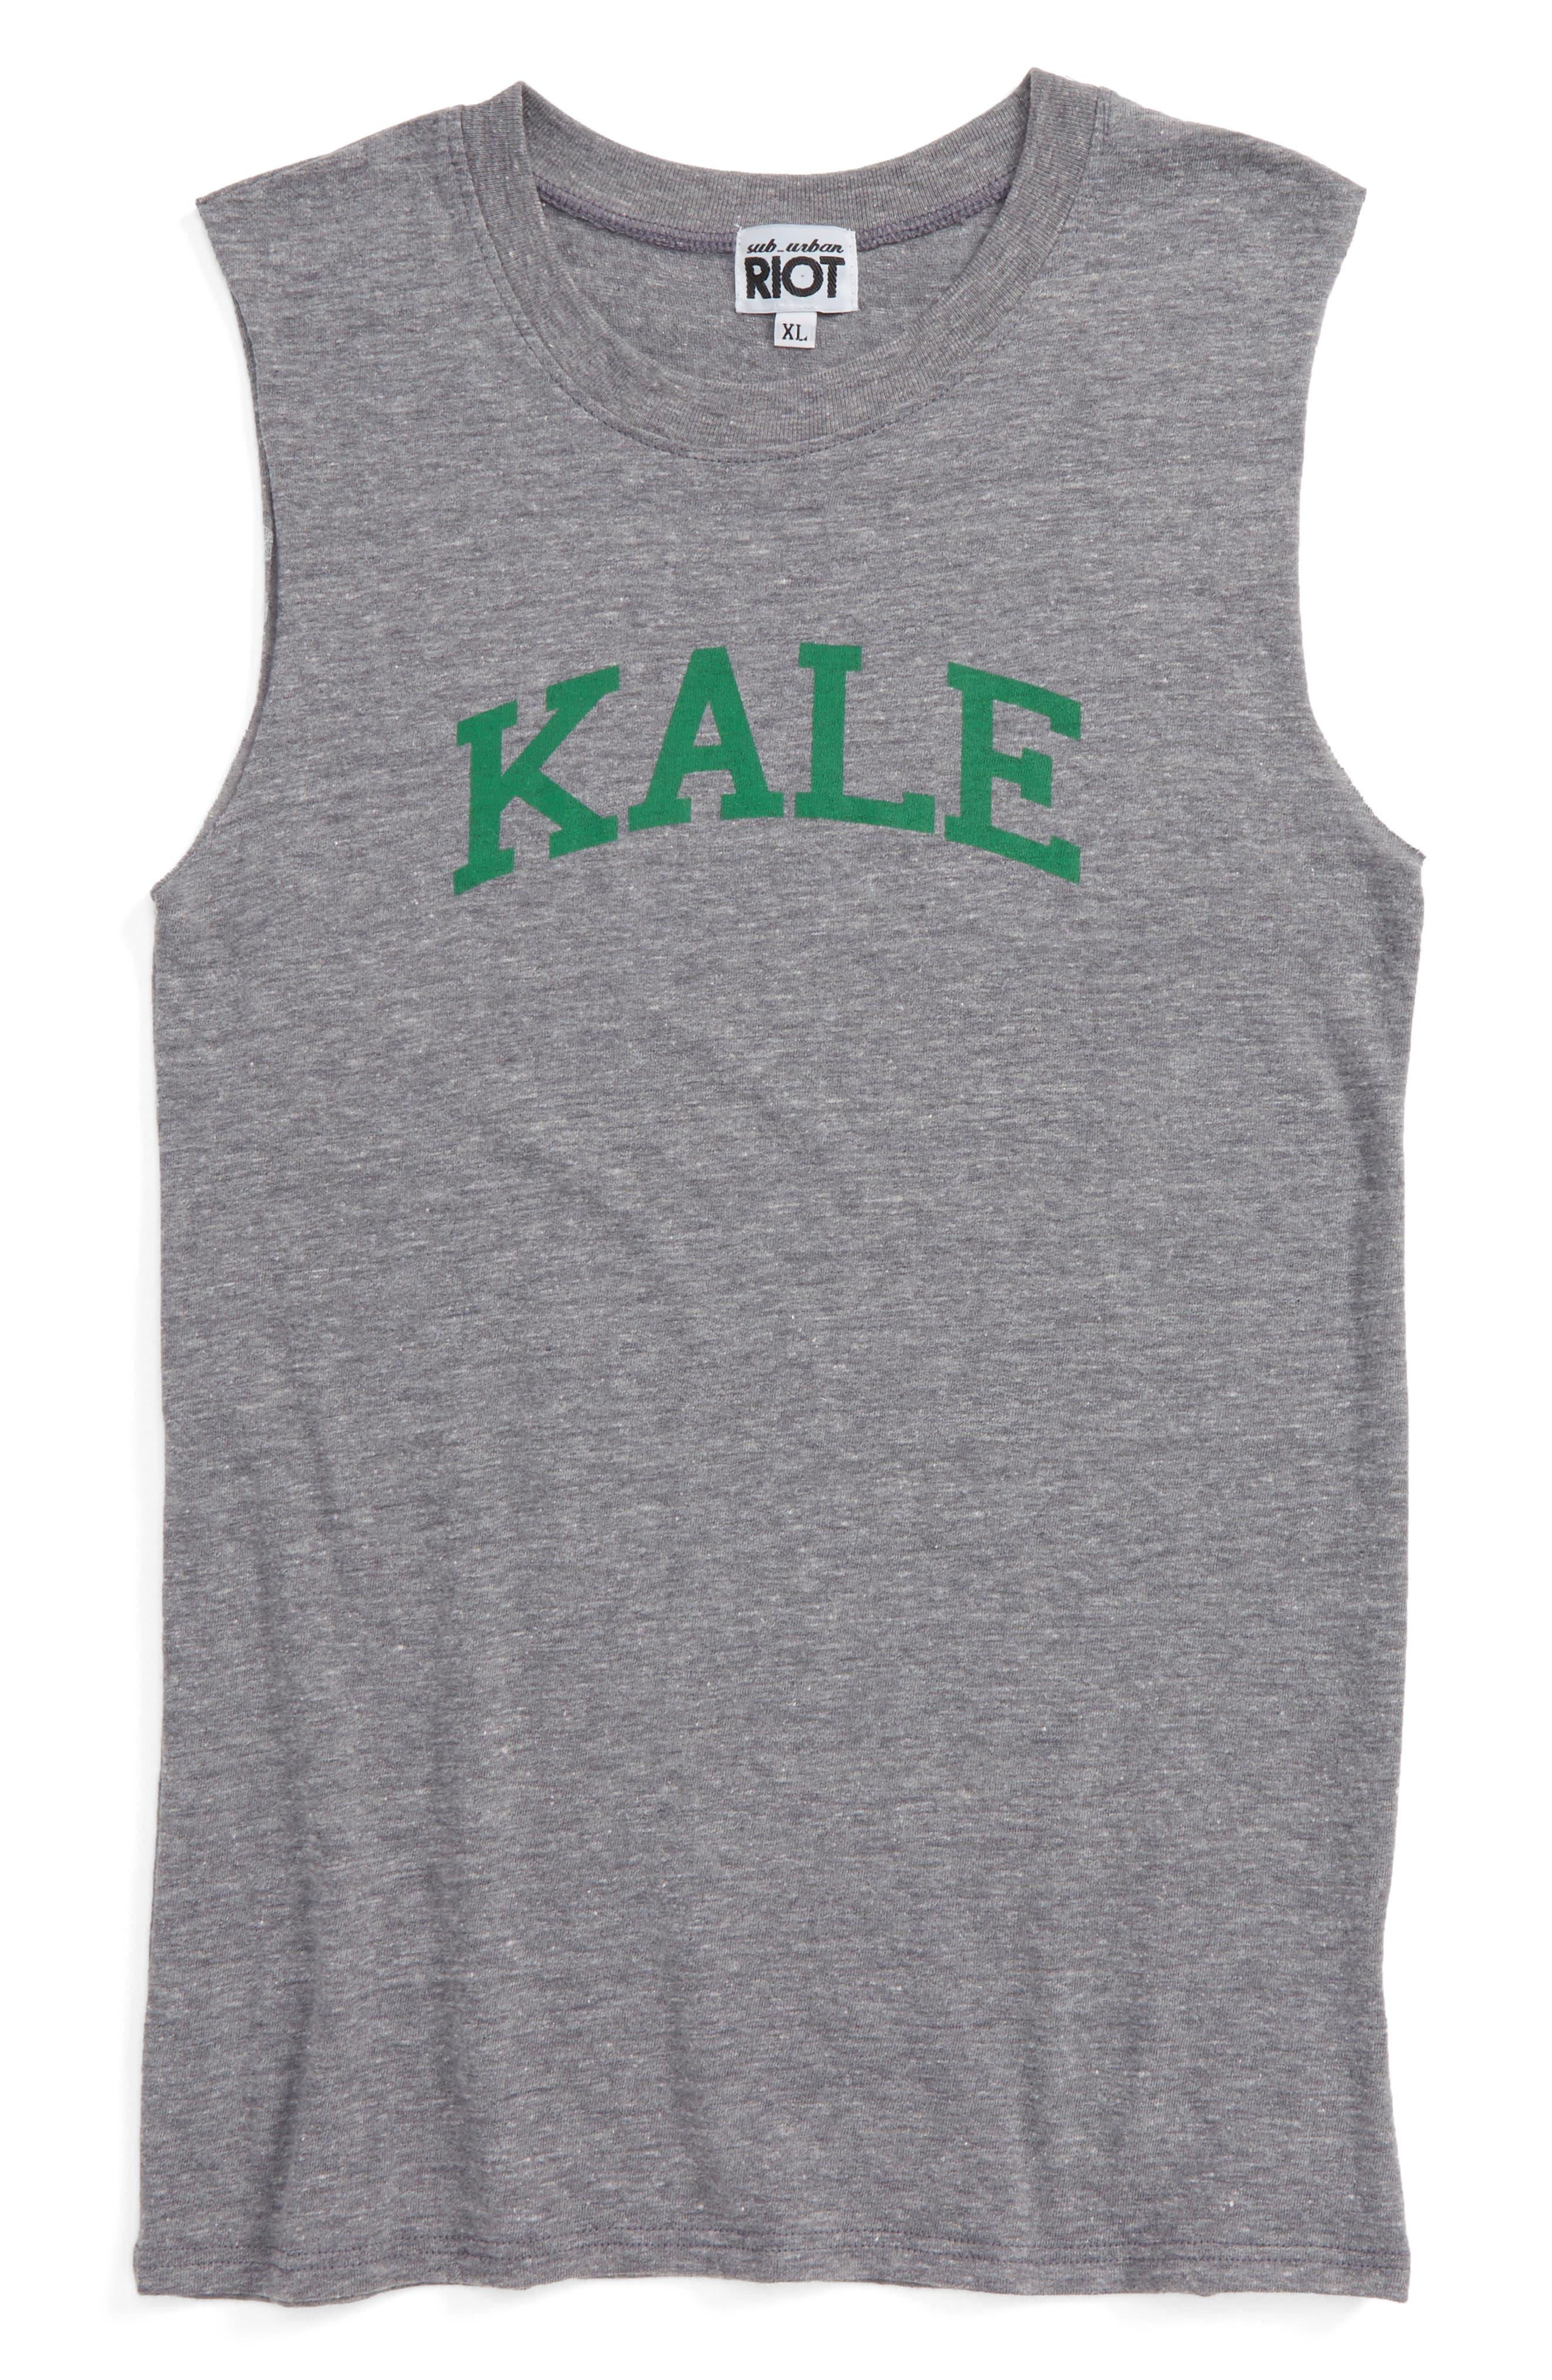 Sub_Urban Riot Kale Muscle Tee (Big Girls)